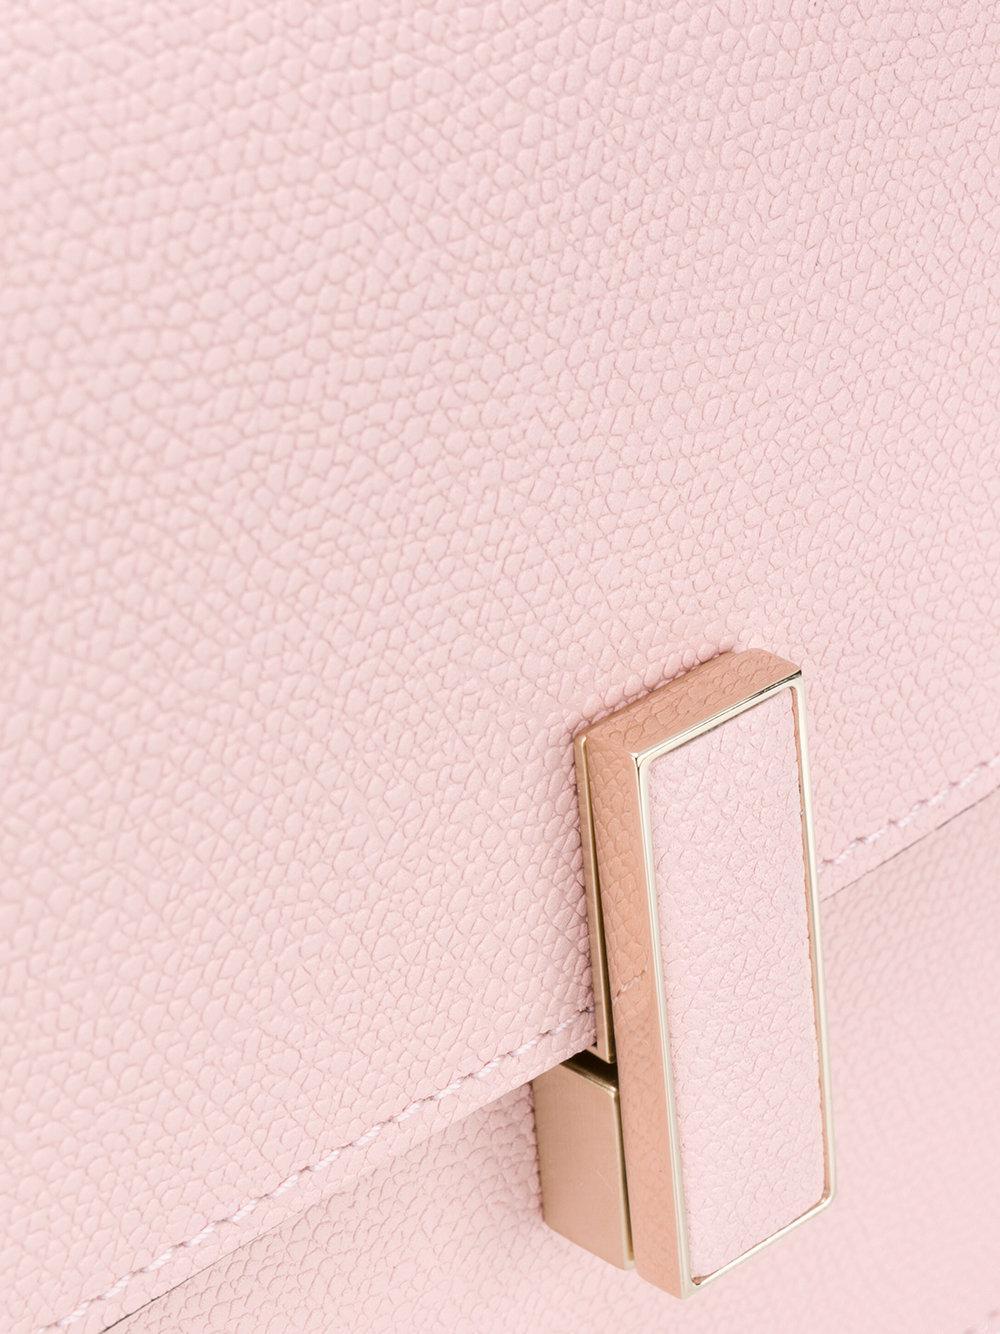 Valextra Leather Foldover Cross-body Satchel in Pink & Purple (Pink)